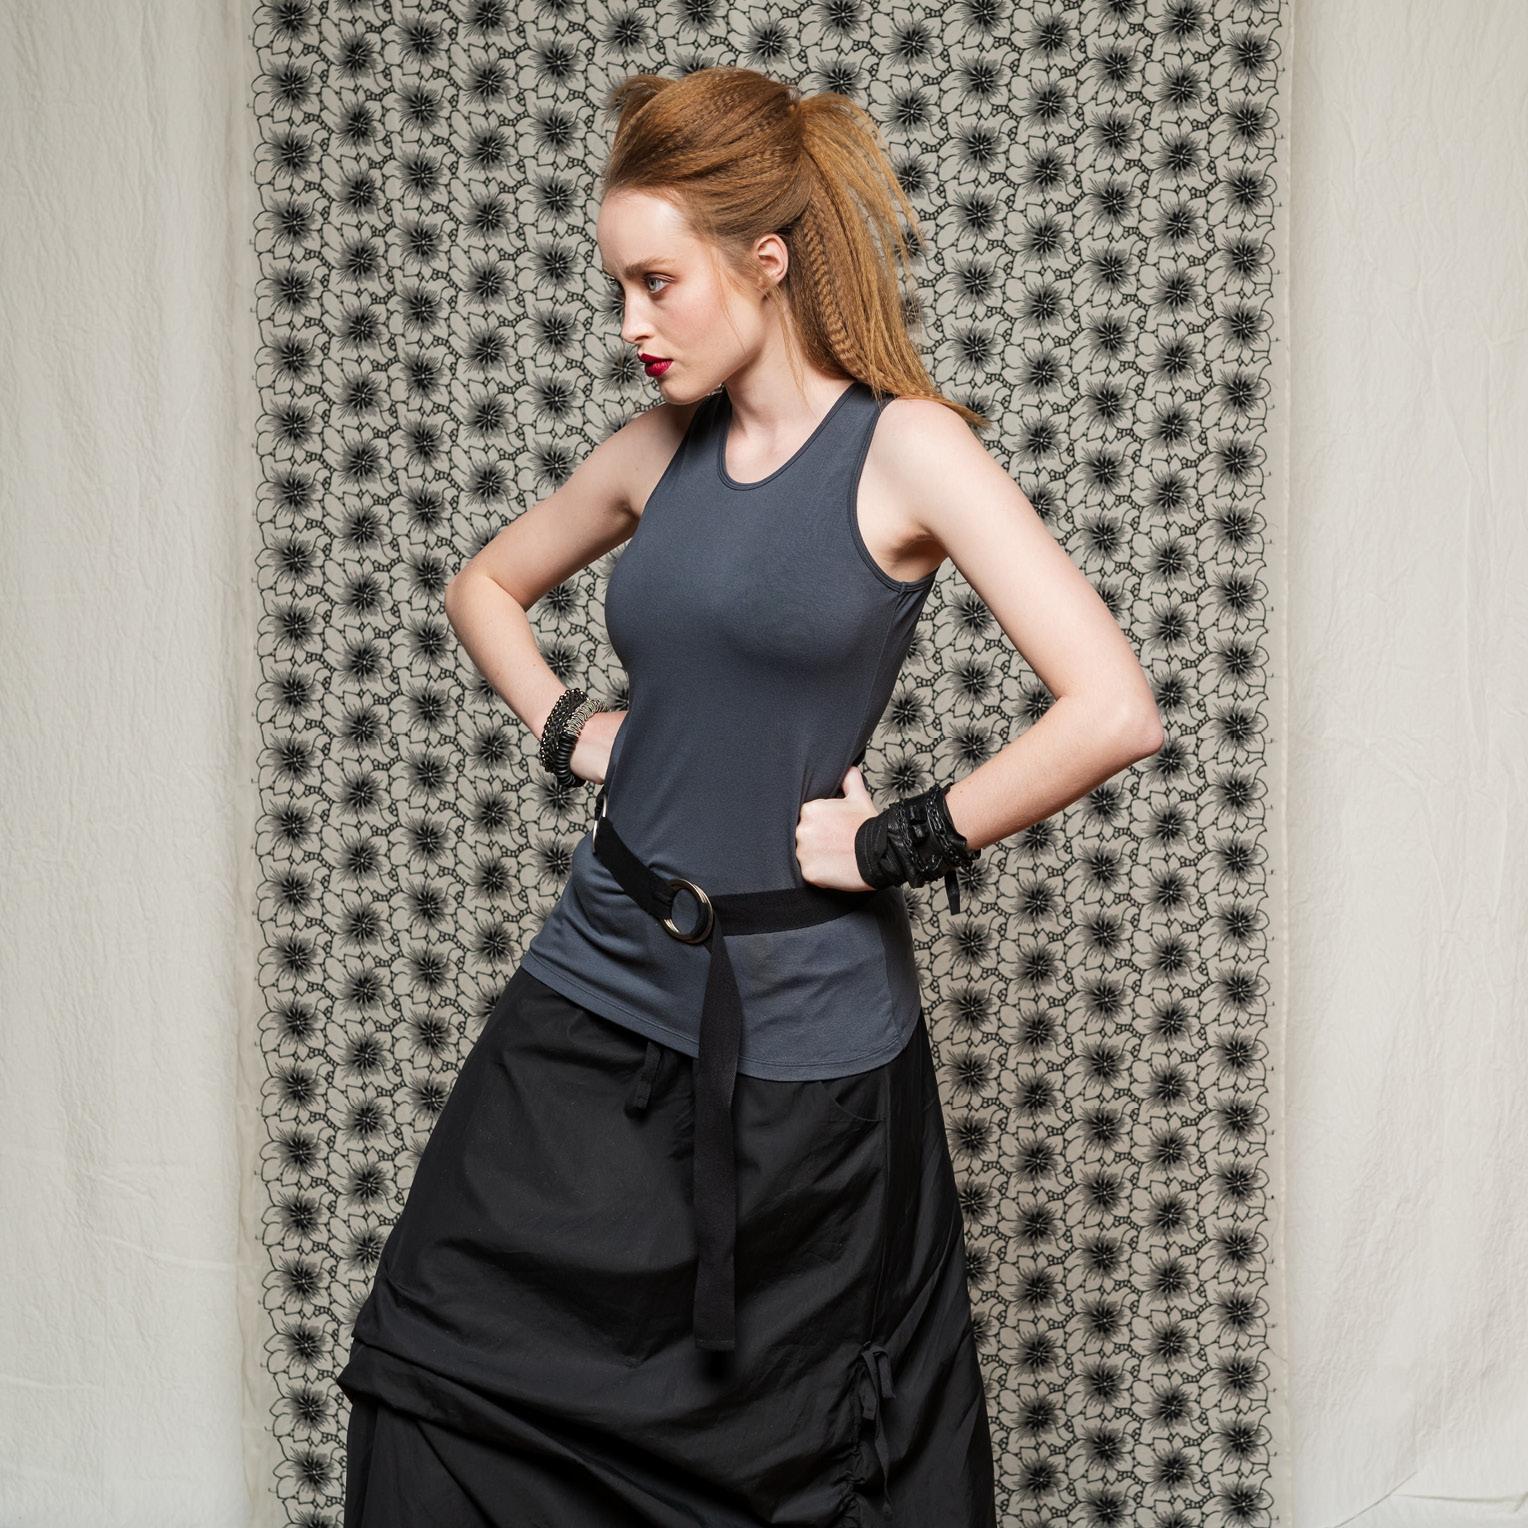 Obsidian Top, Marmalade Skirt & Circle Belt